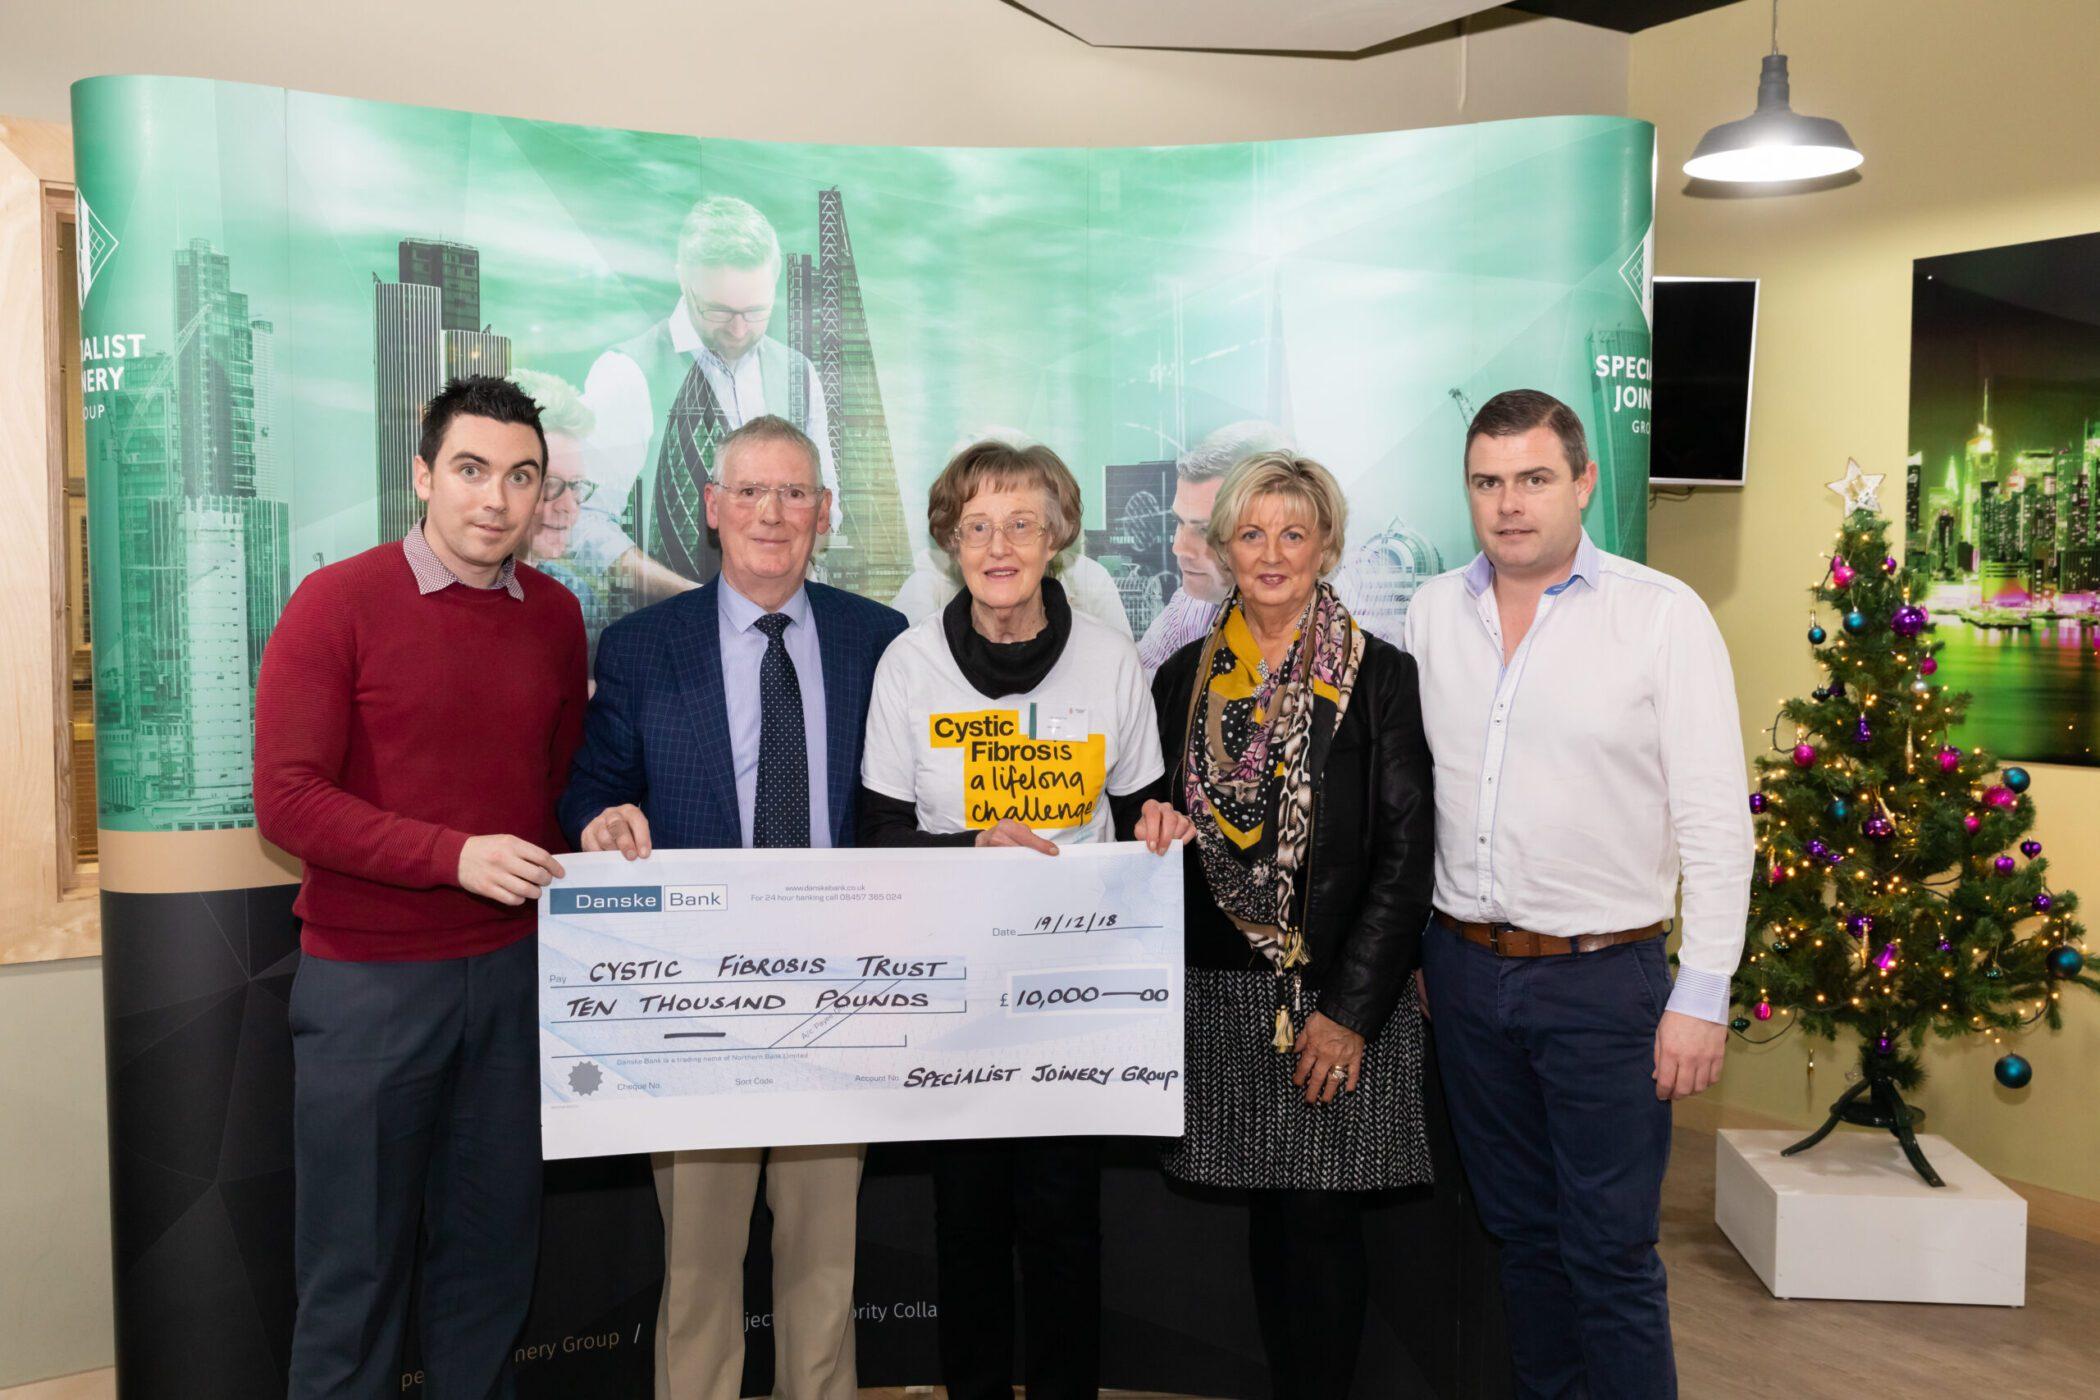 Dermot, John Bosco and Ciaran O'Hagan presenting donation to Cystic Fibrosis Trust